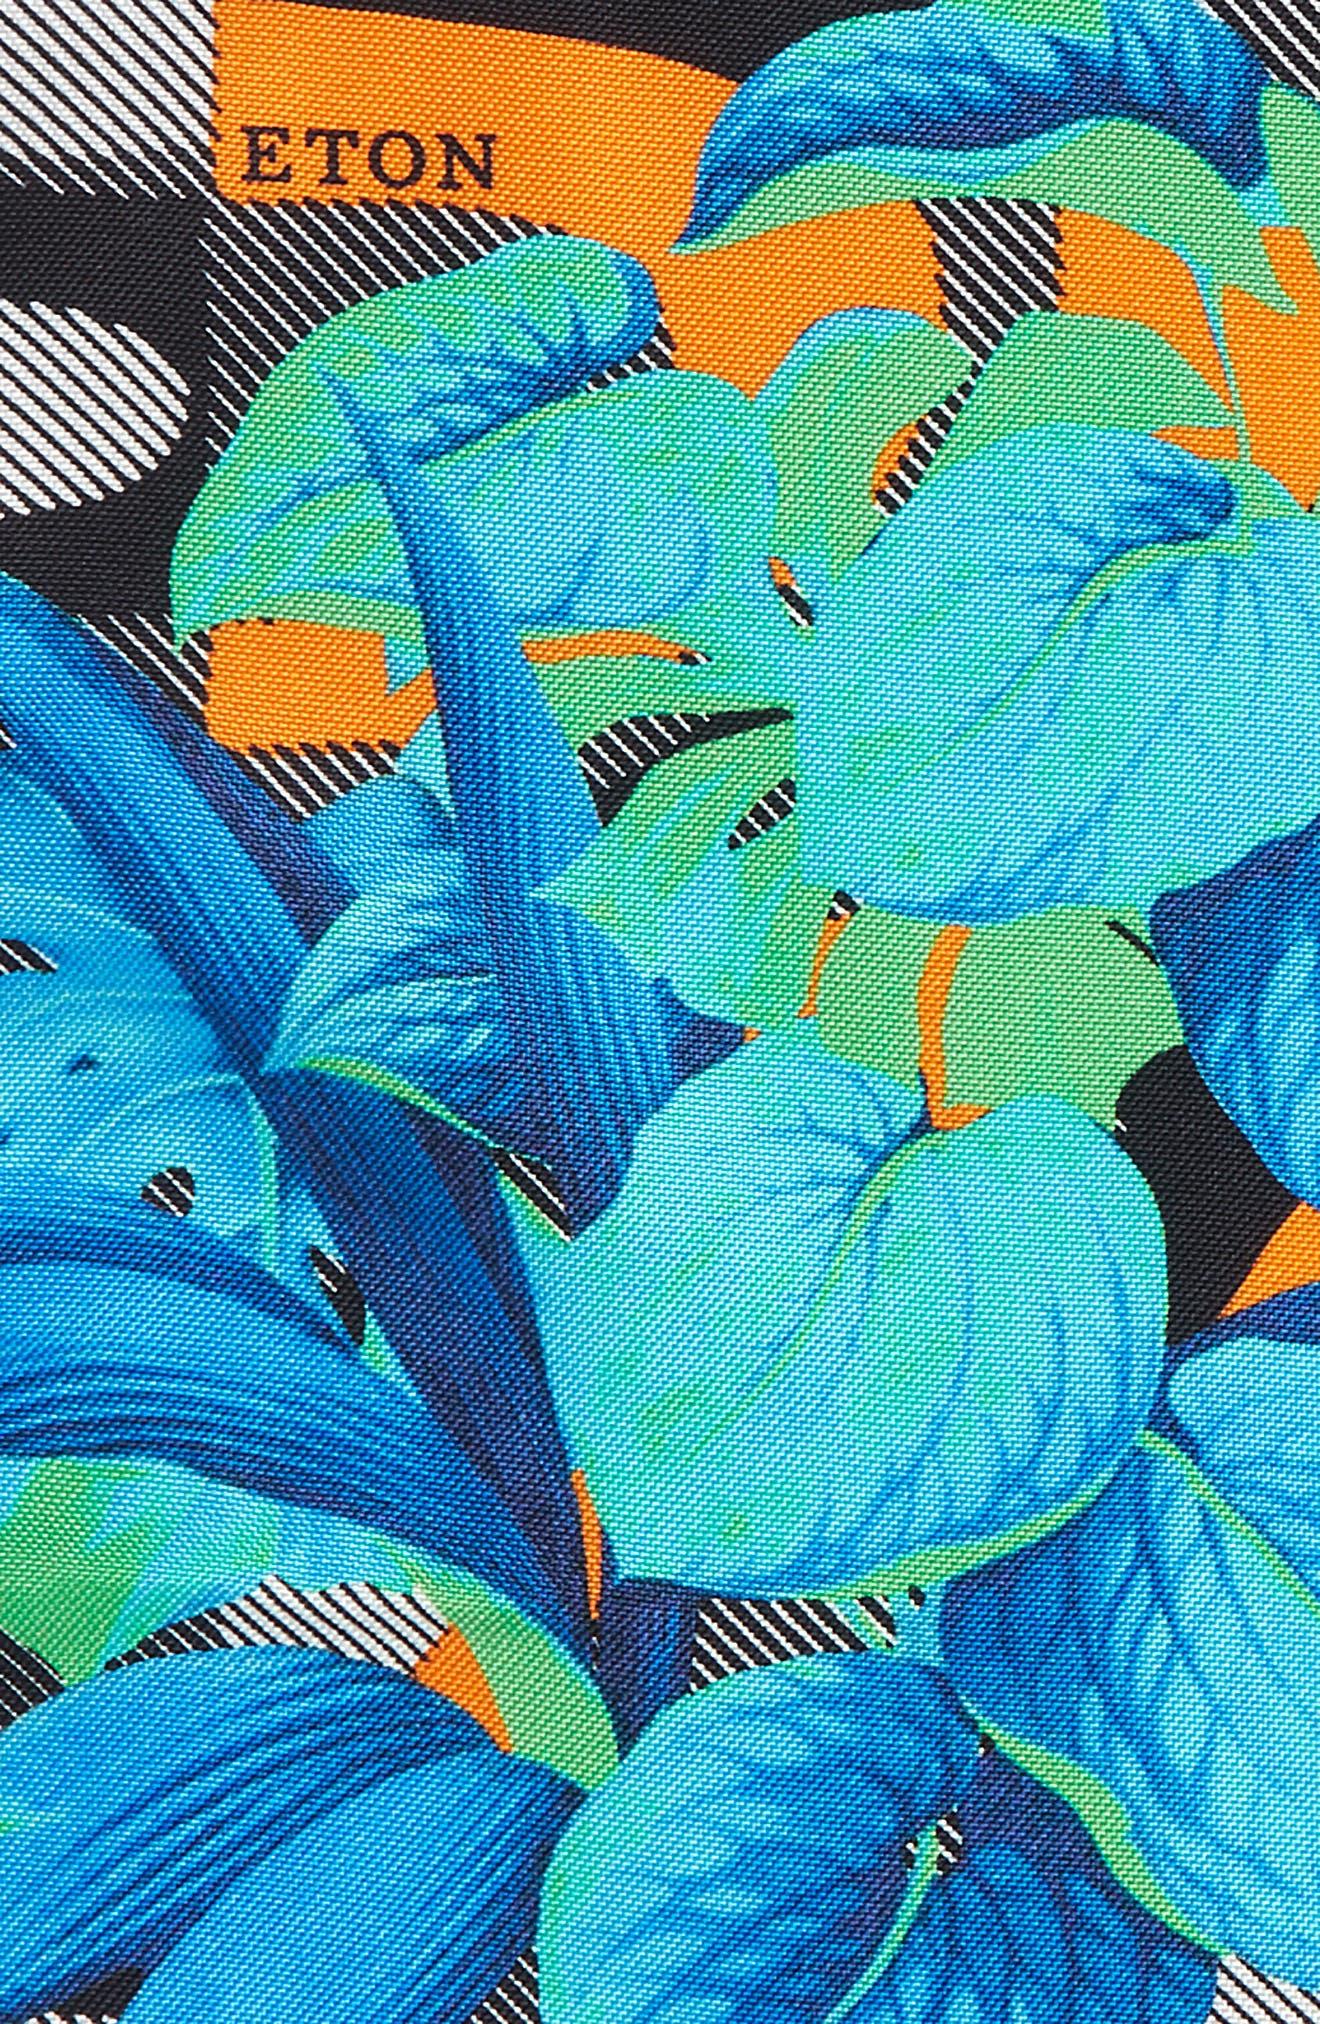 Tropical Floral Silk Pocket Square,                             Alternate thumbnail 3, color,                             400